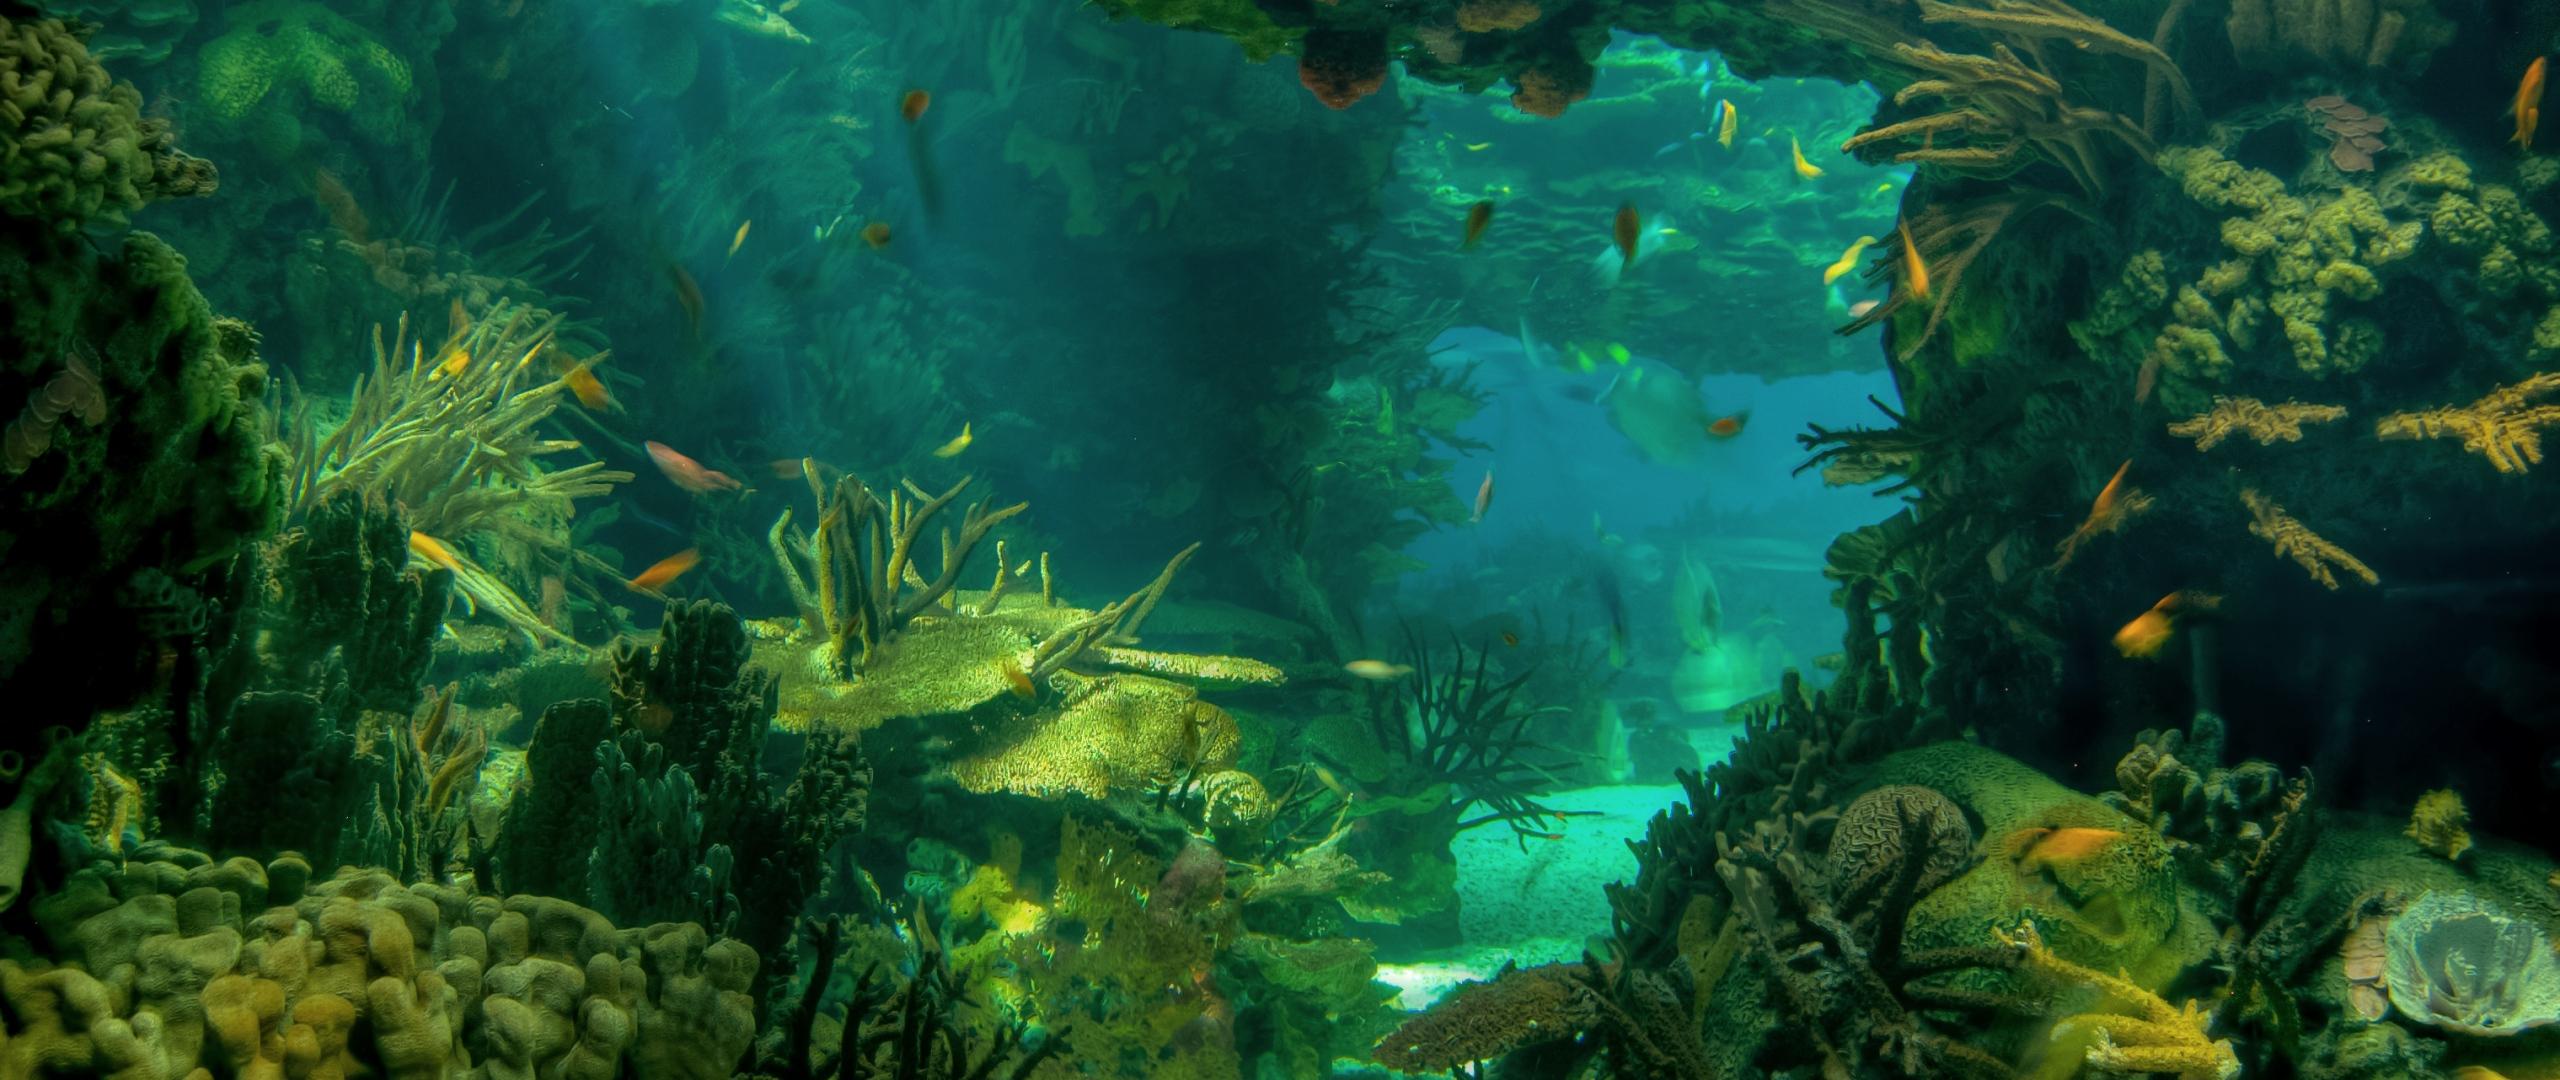 2560x1080 Wallpaper sea seabed landscape 2560x1080